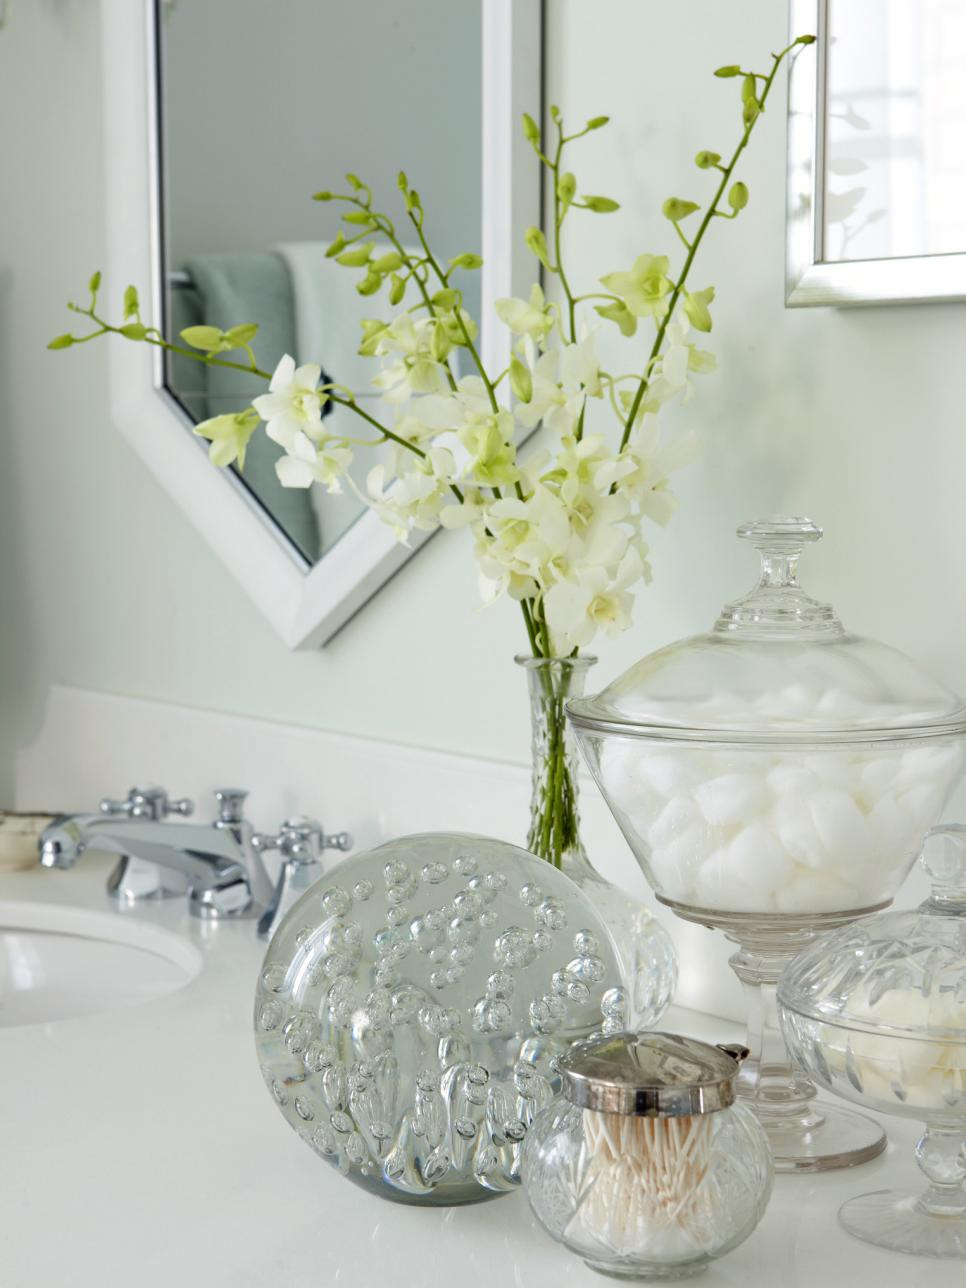 Preparing Your Guest Bathroom for Weekend Visitors | HGTV